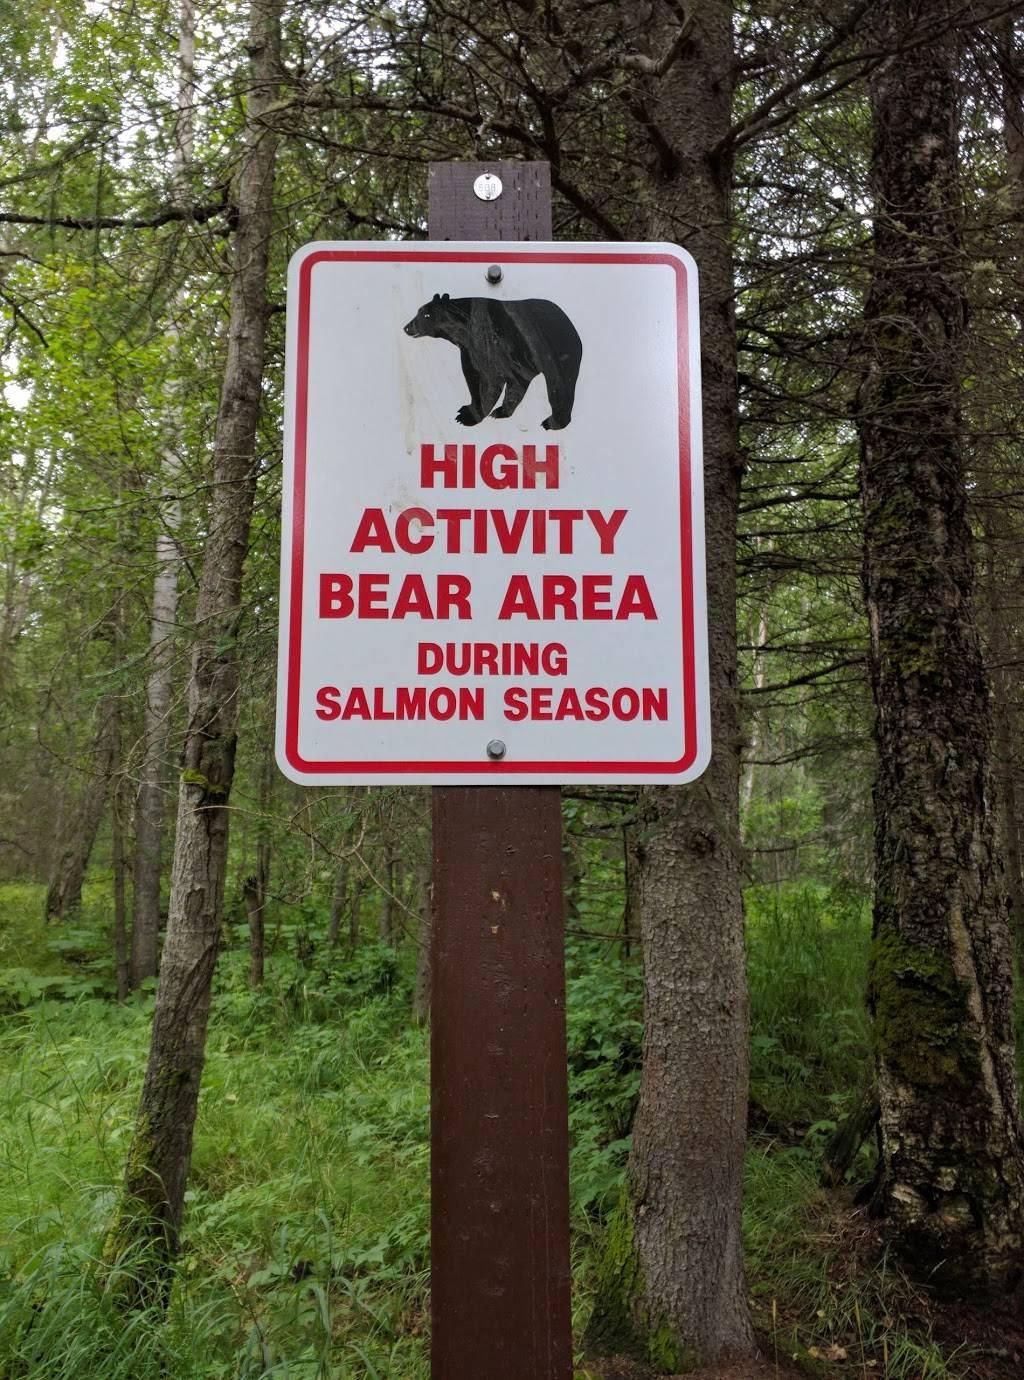 Far North Bicentennial Park - park  | Photo 1 of 10 | Address: 4970 Campbell Airstrip Rd, Anchorage, AK 99507, USA | Phone: (907) 343-4355